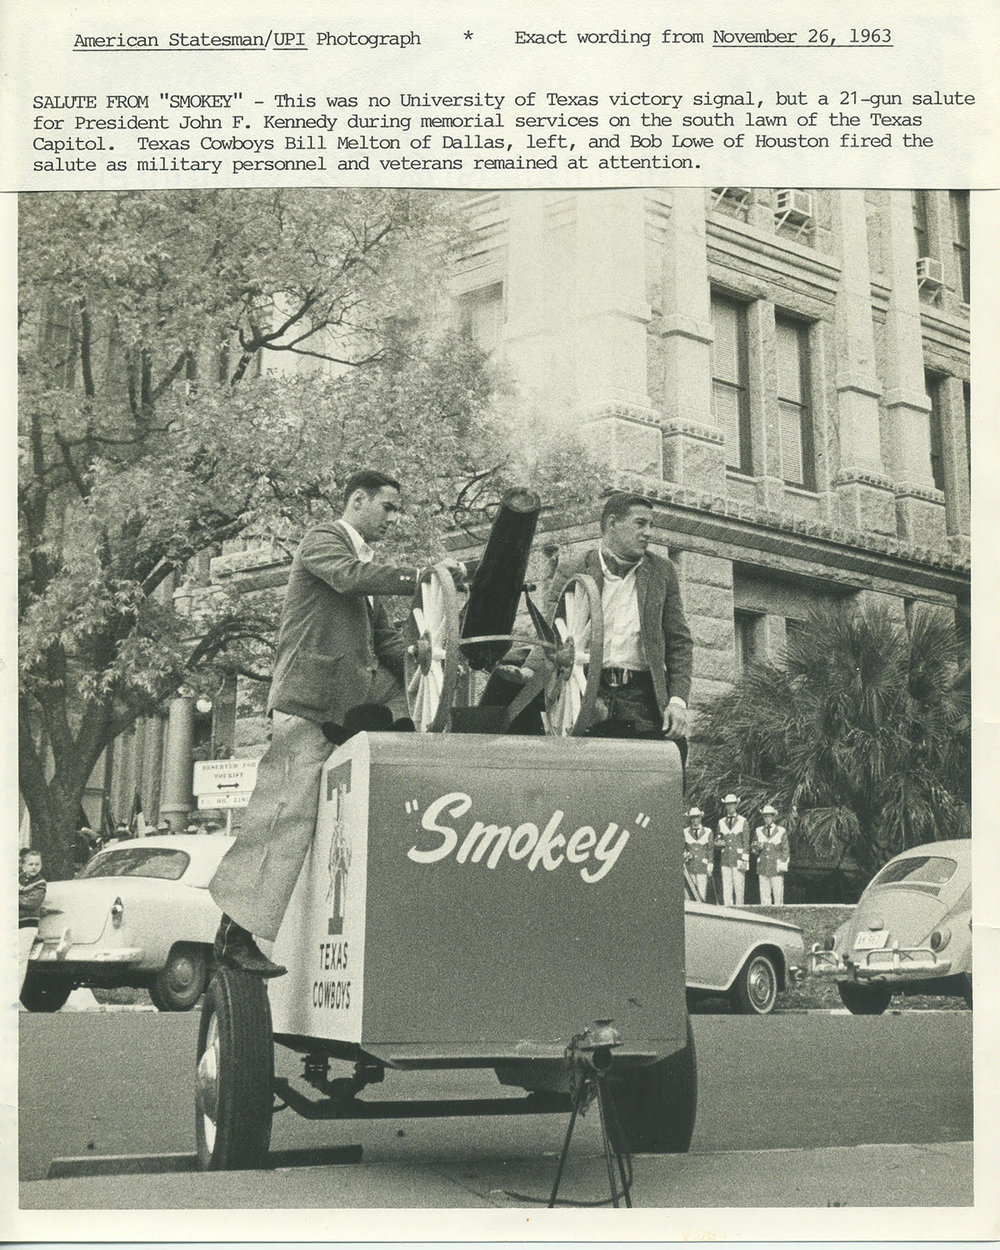 Smokey_AmericanStatesman.jpg